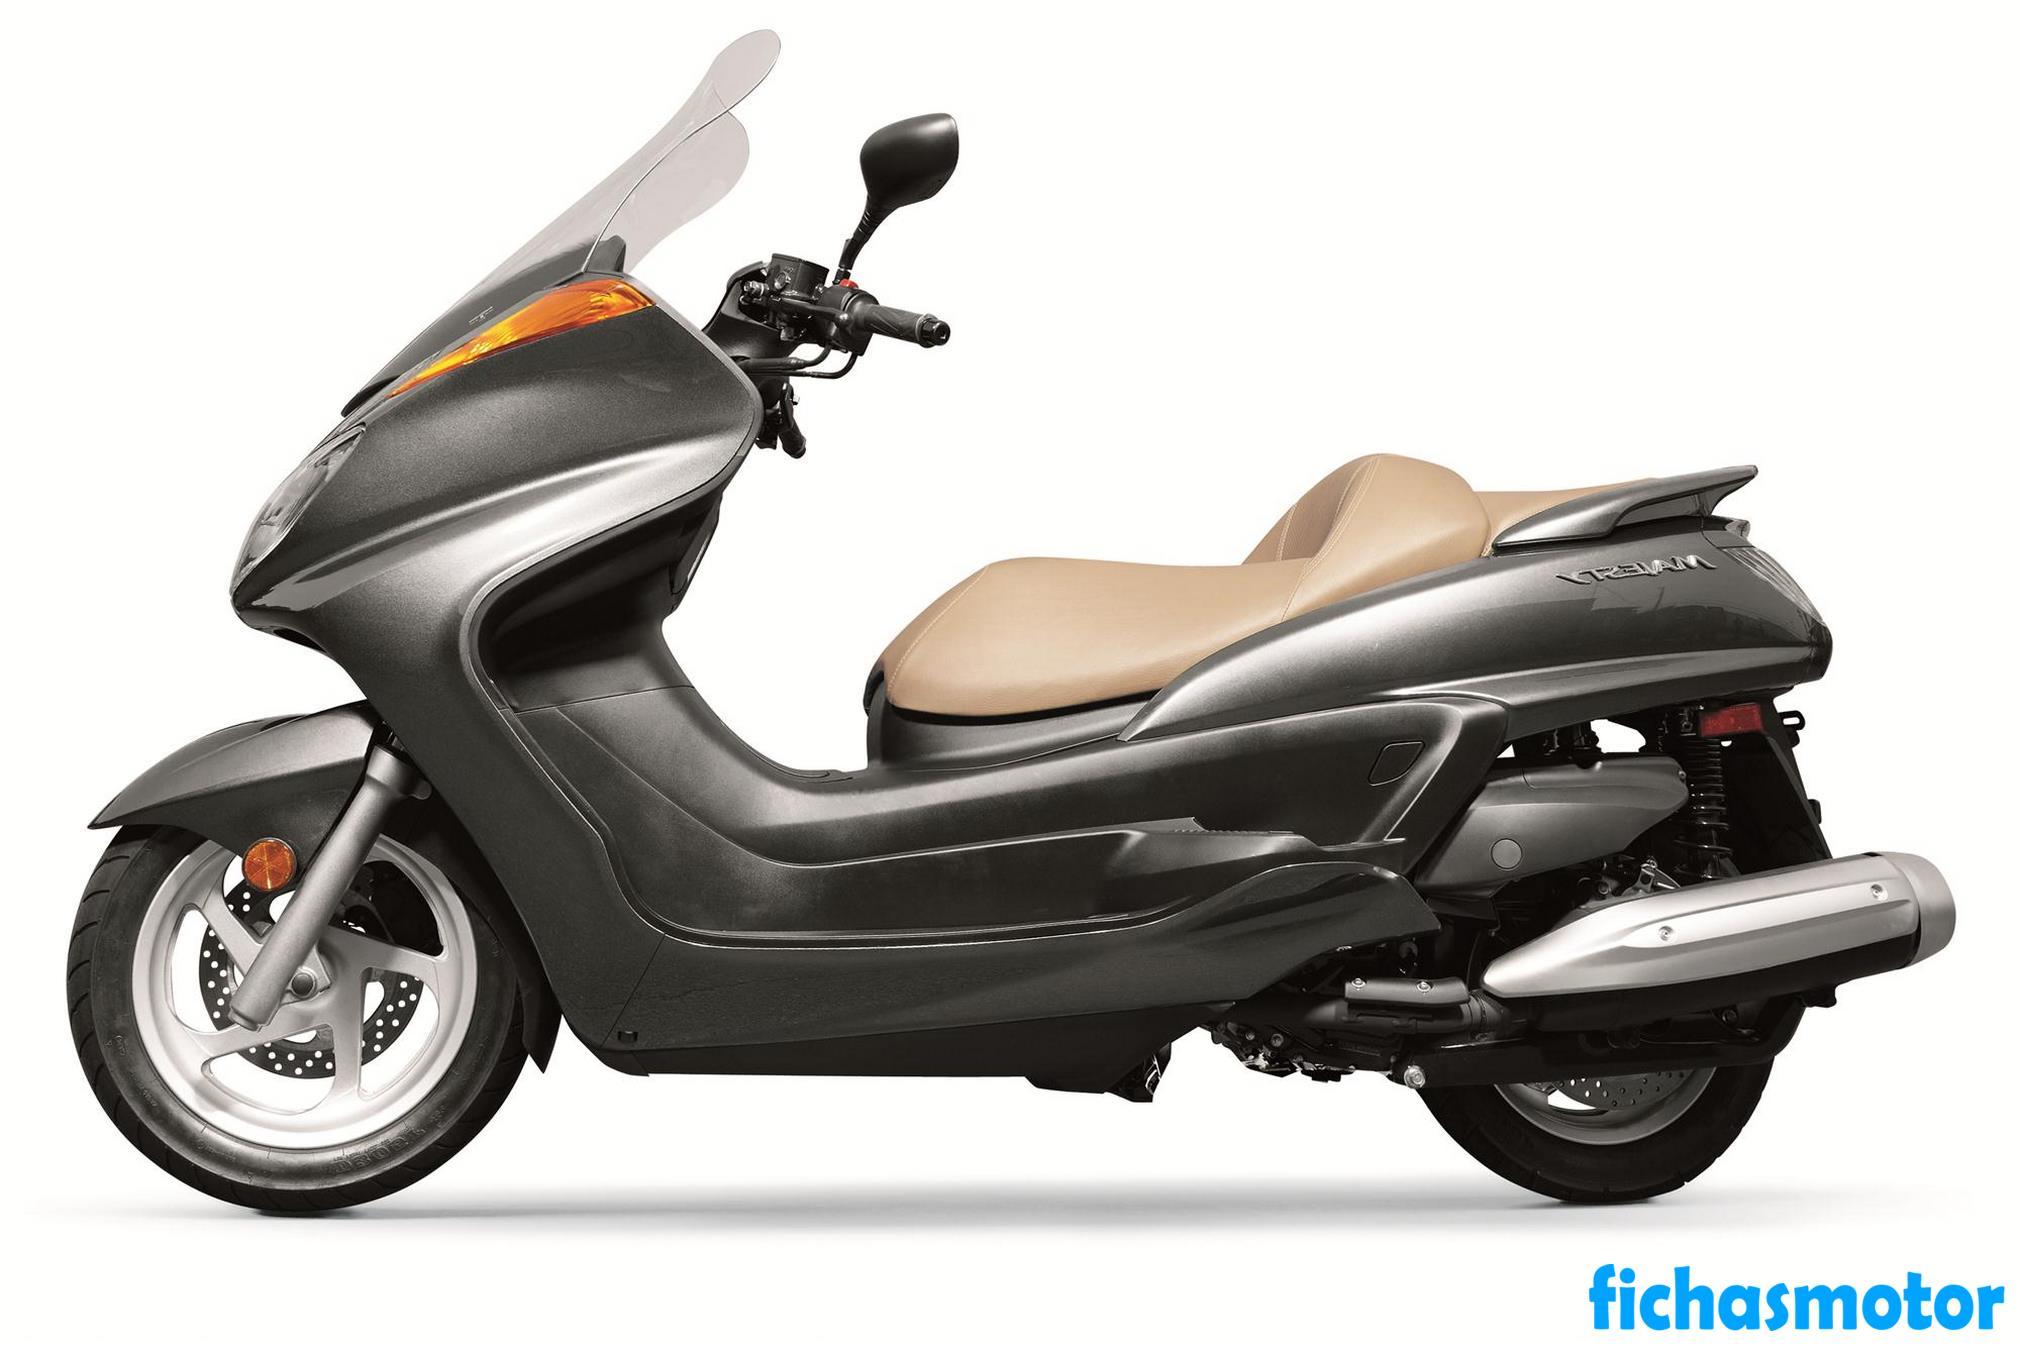 Ficha técnica Yamaha majesty 2014